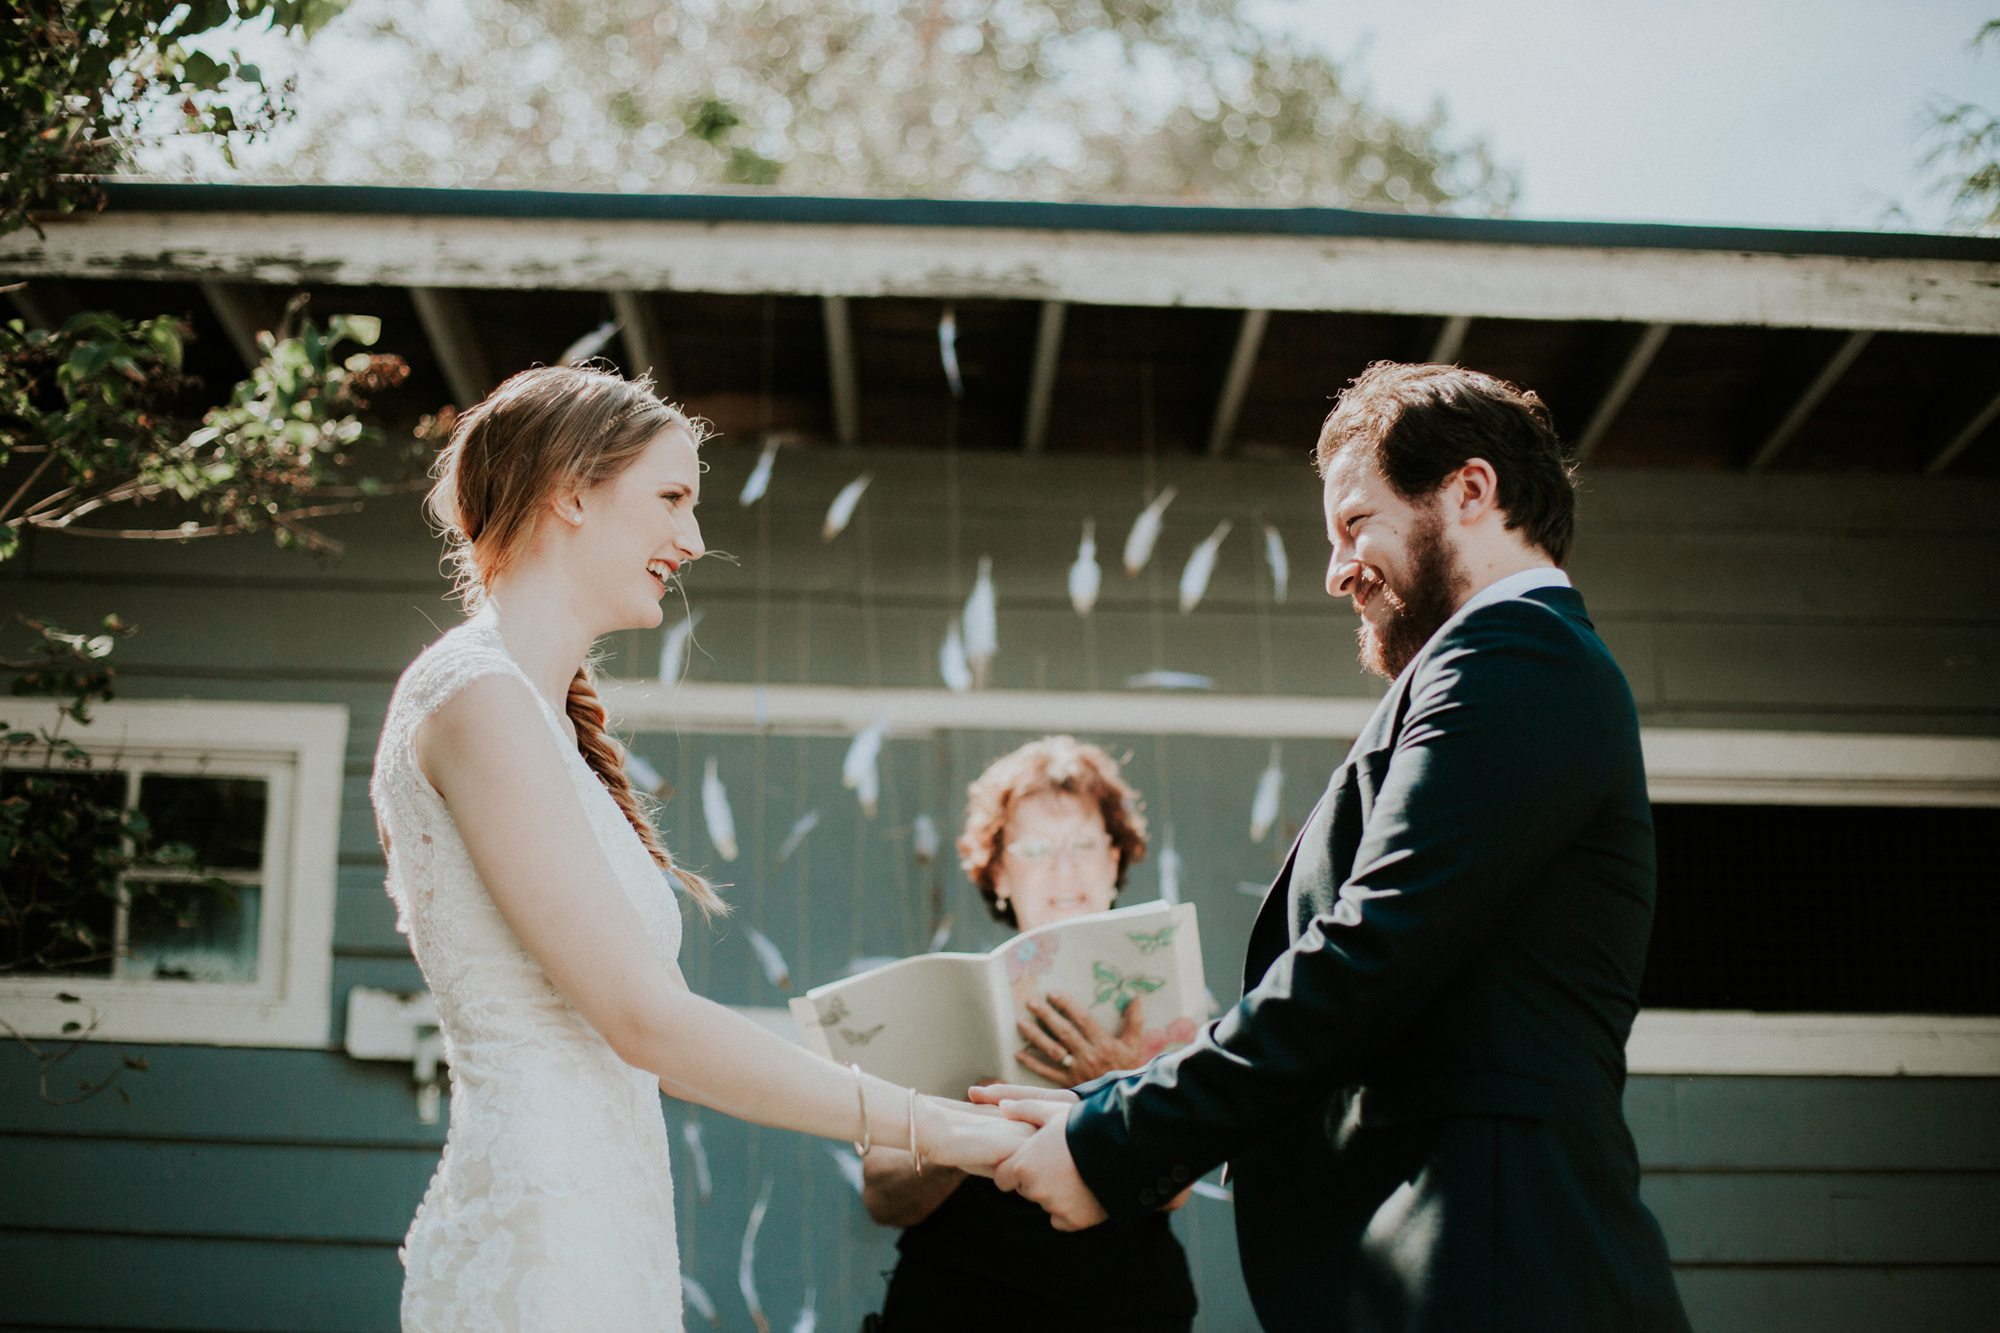 825-abbotsford-wedding-photographer